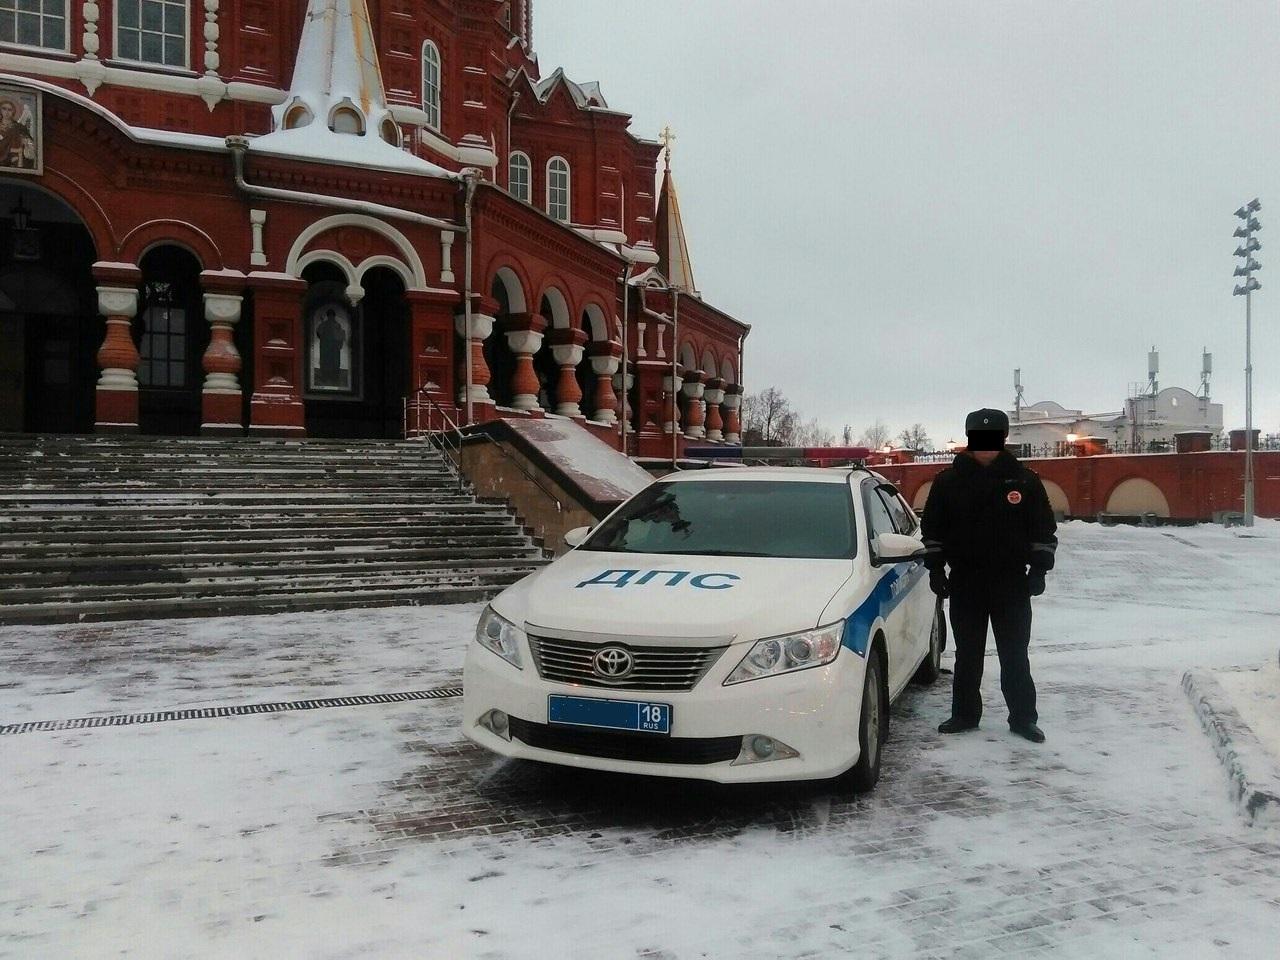 Фото: vk.com/udmurtiya18rus